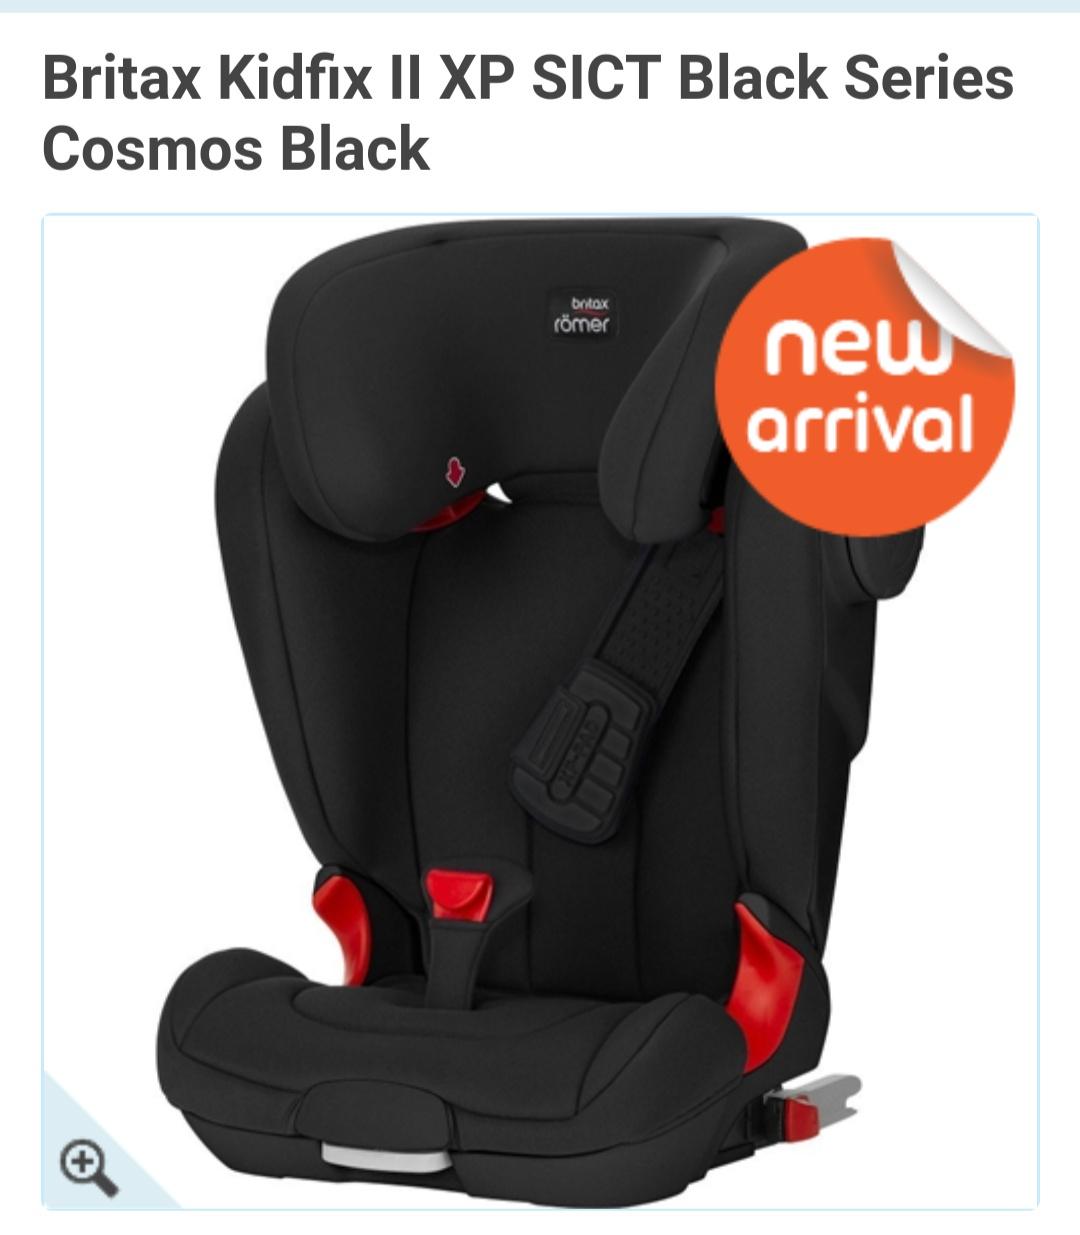 Britax Kidfix II XP SICT Black Edition - £135 Delivered @ BabysMart